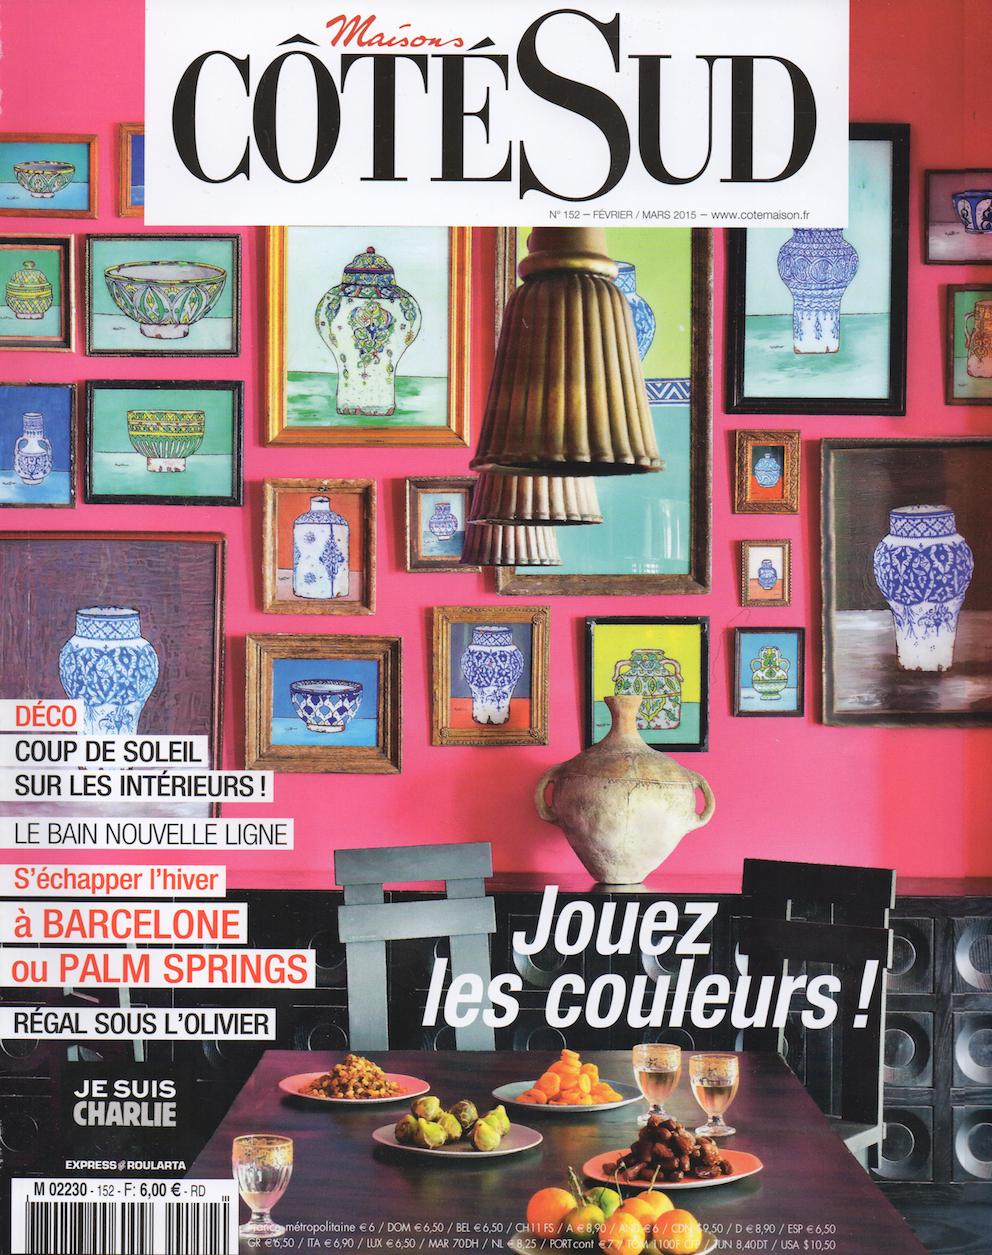 Cote Sud - Fevrier 2015 - Cover